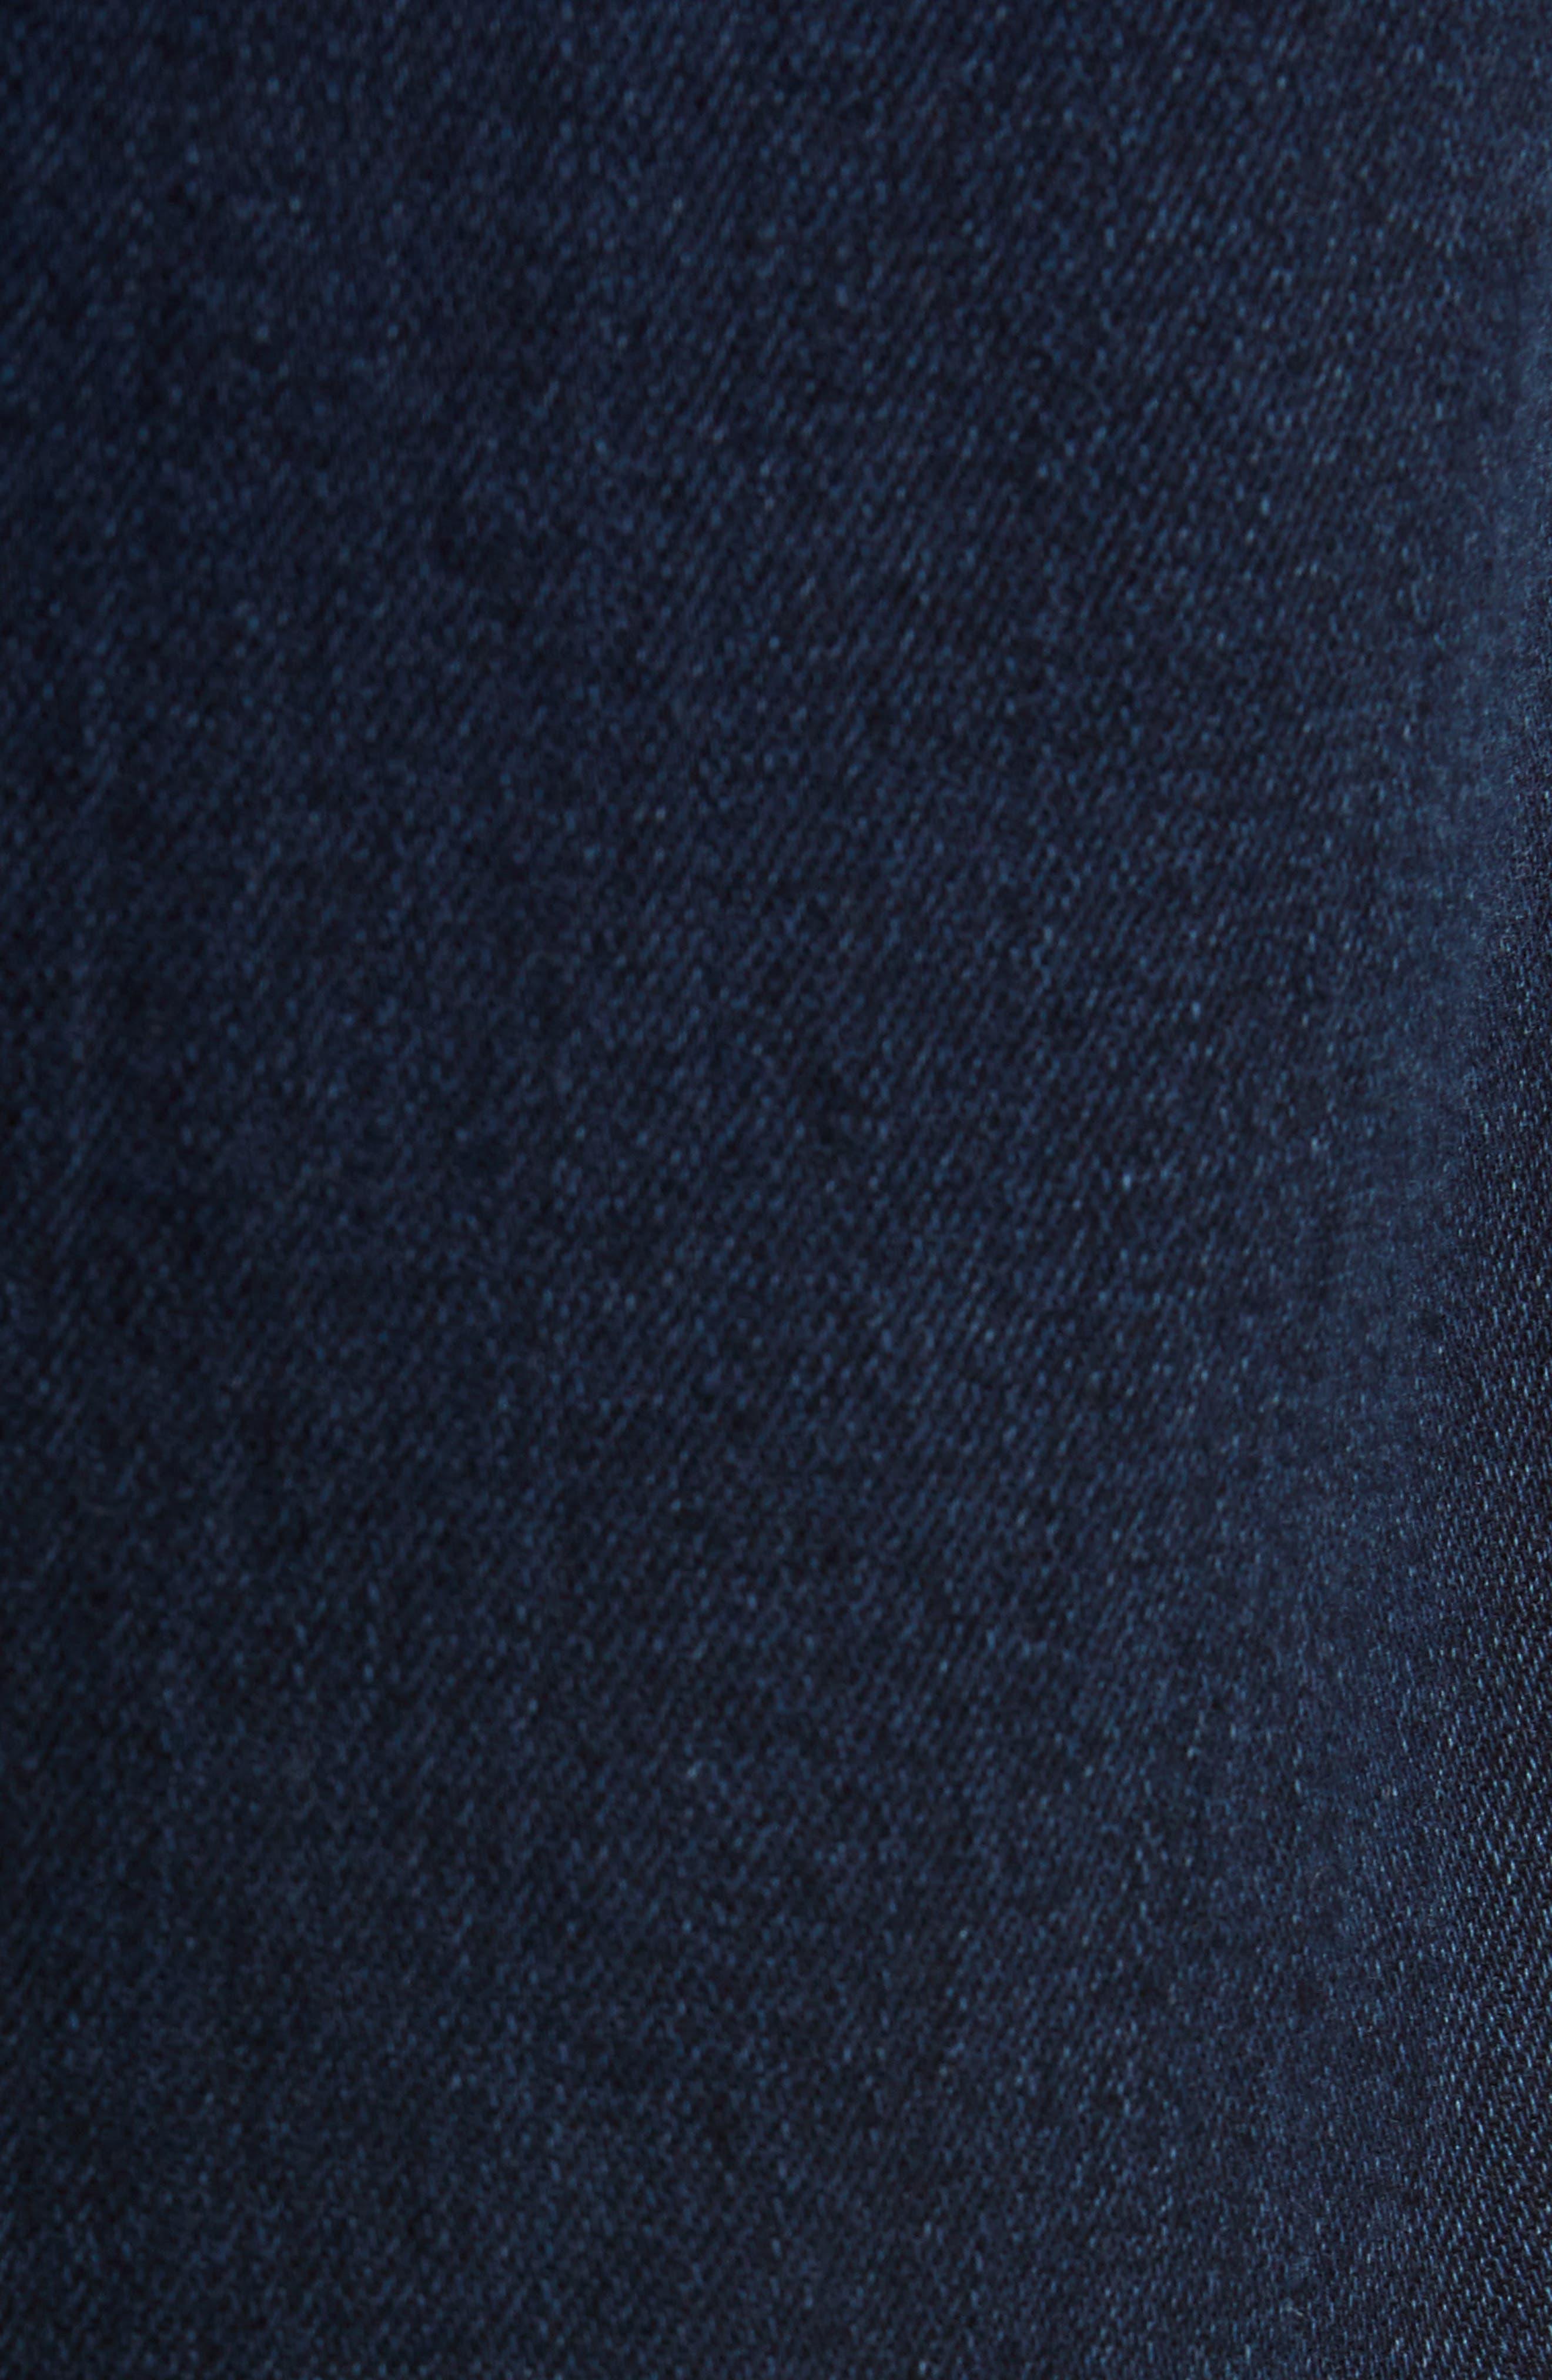 Fit 3 Slim Straight Leg Jeans,                             Alternate thumbnail 5, color,                             BAYVIEW